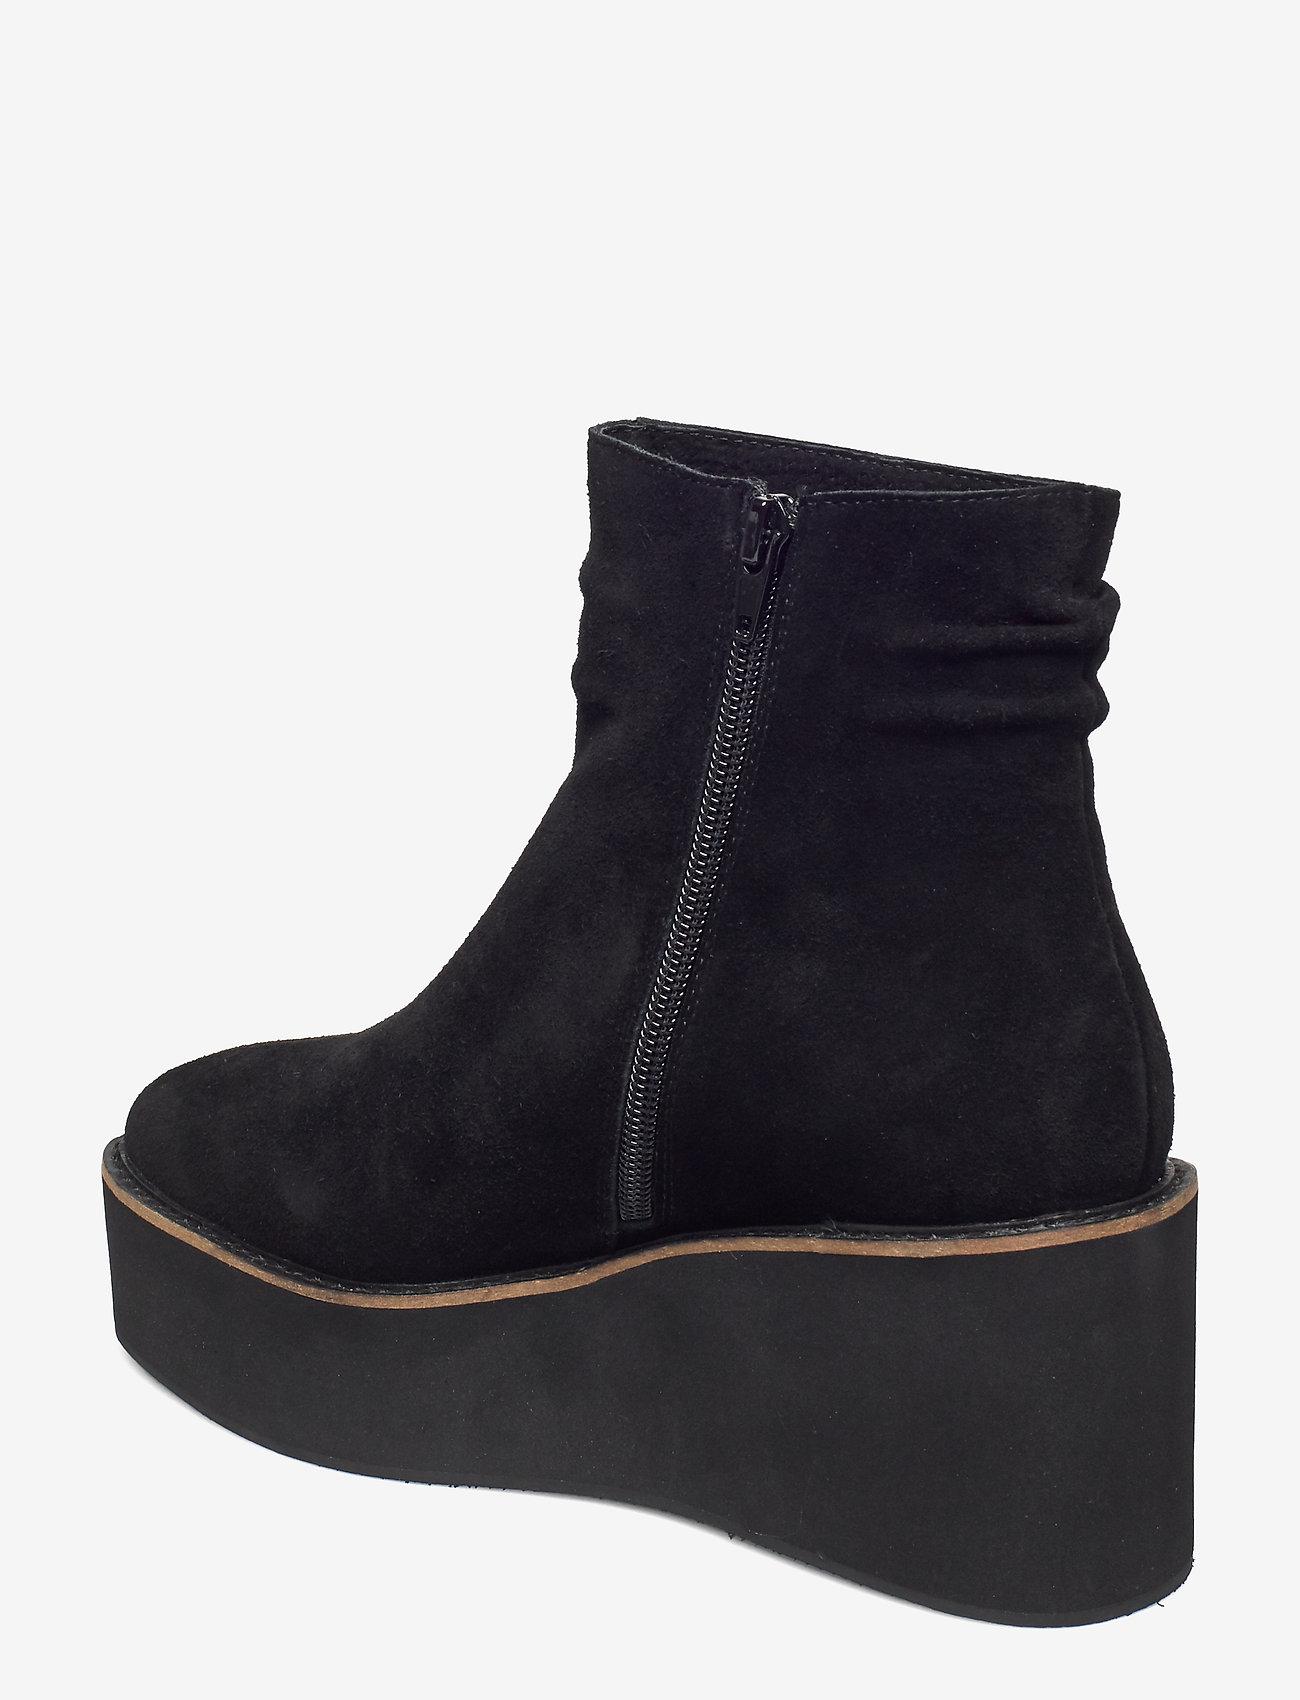 Shoe The Bear GAIA S - Stiefel BLACK - Schuhe Billige